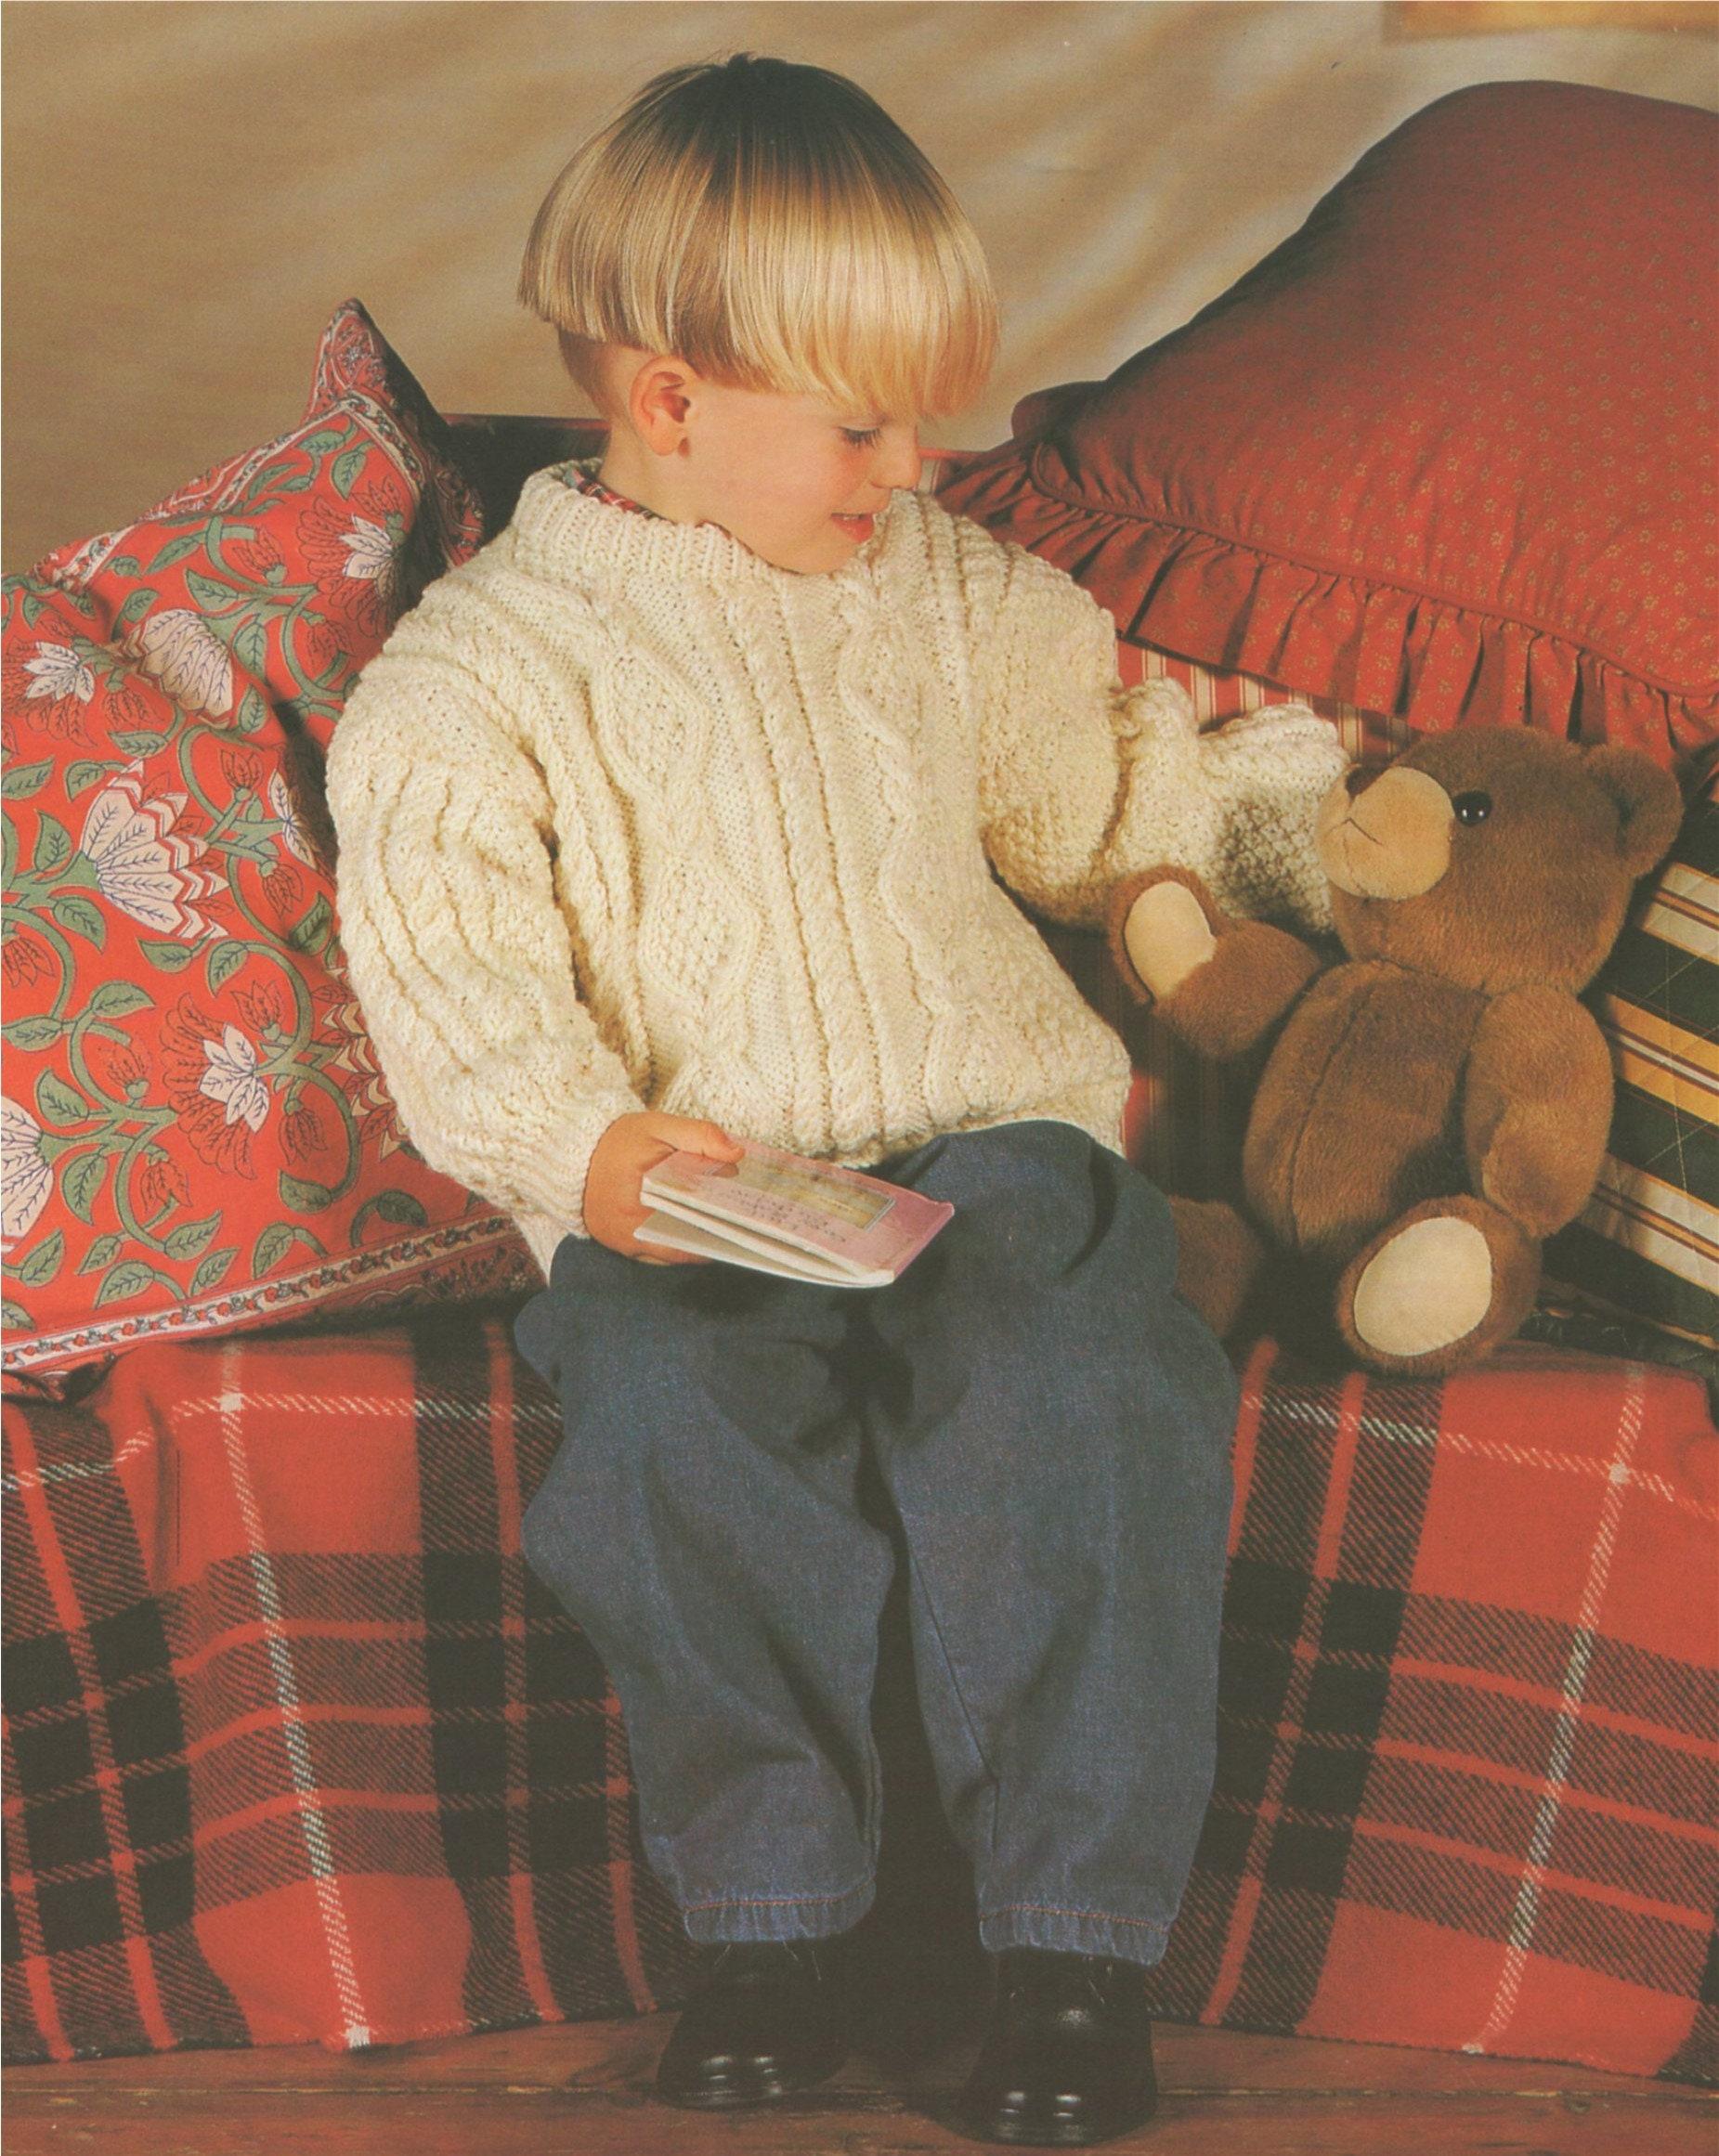 52c5d7a7628 Childrens Aran Sweater Knitting Pattern PDF Boys or Girls 20, 22, 24 ...